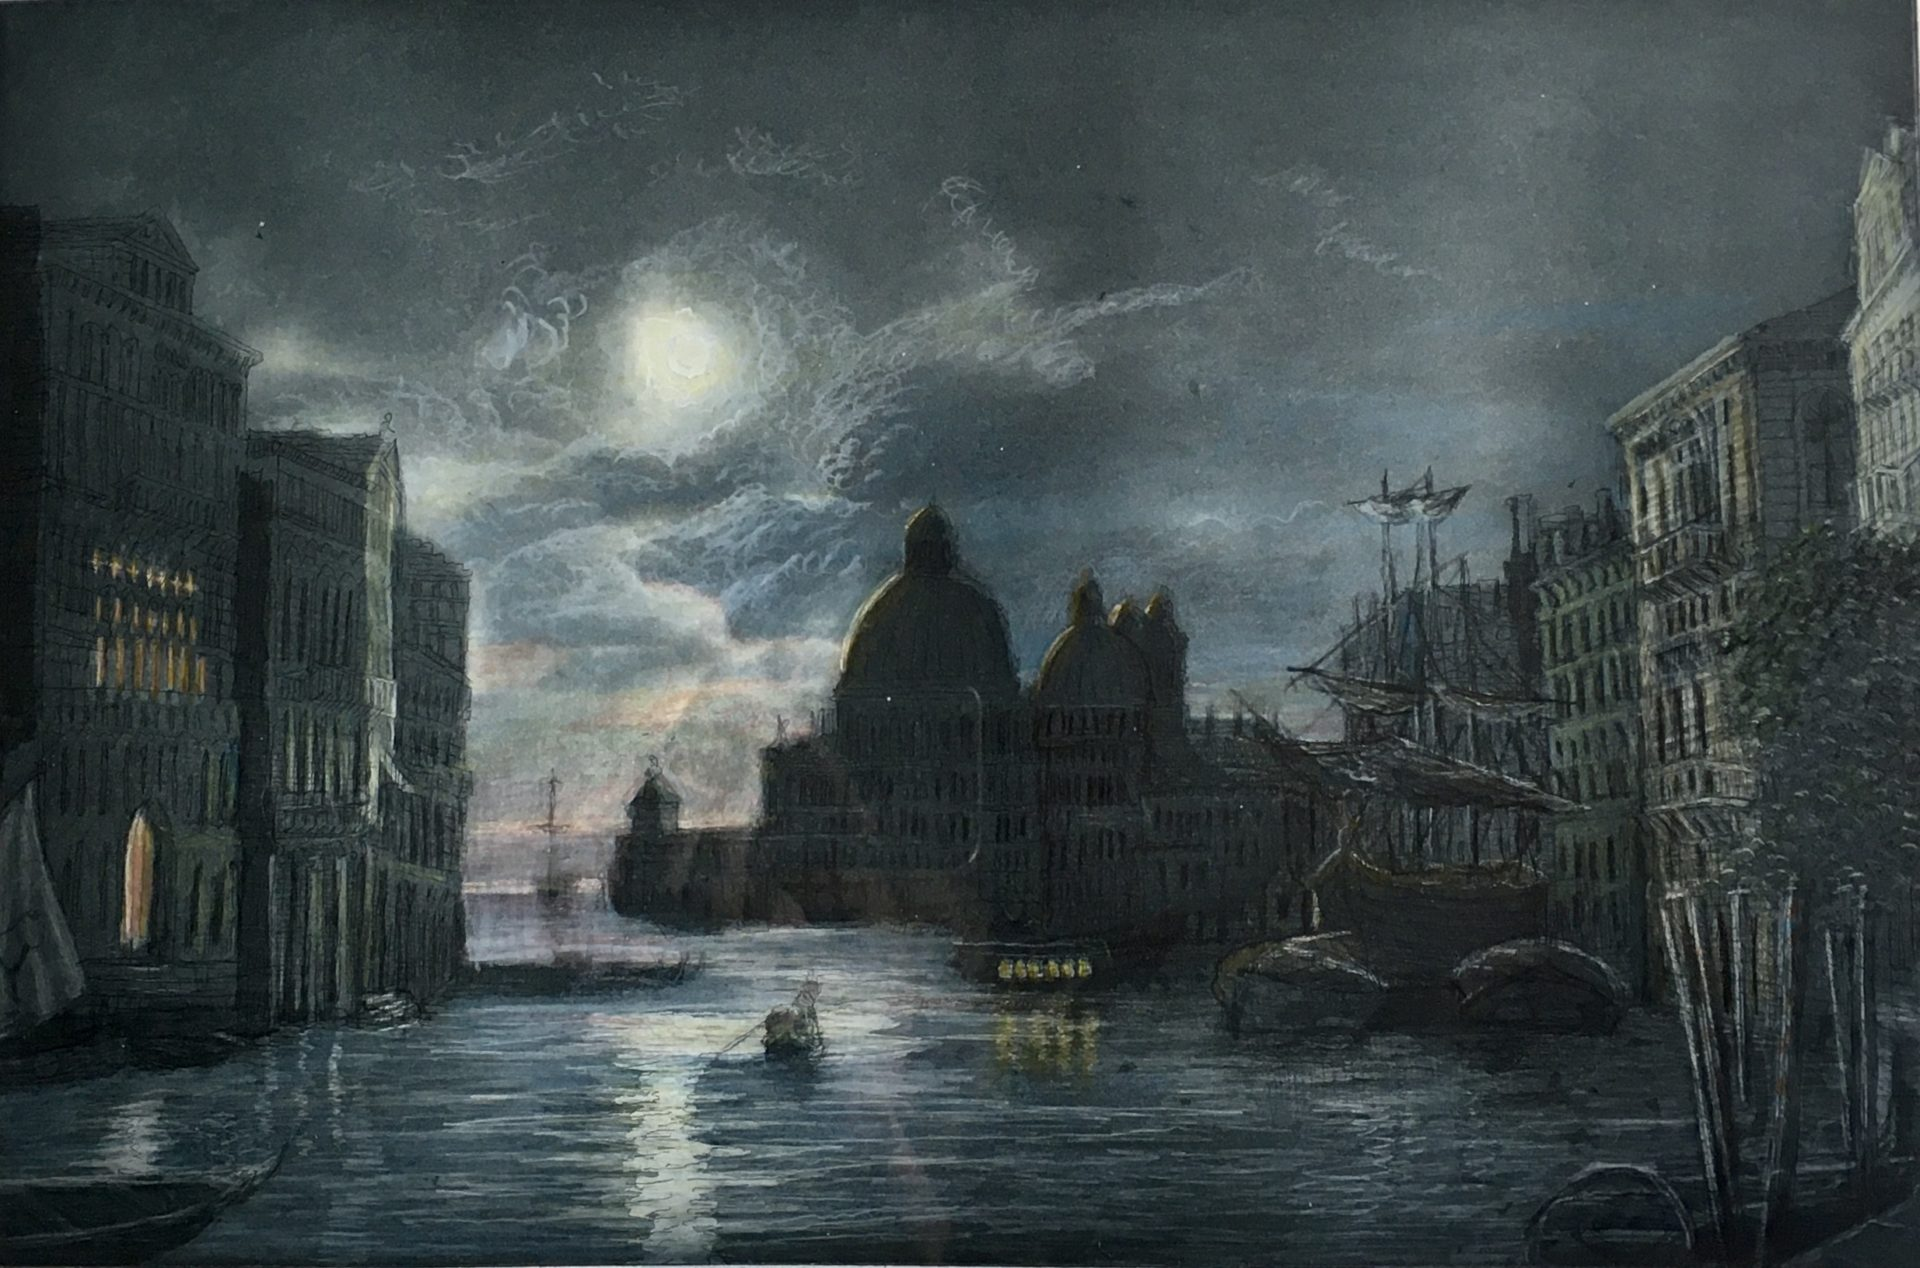 Venedig bei Nacht, handcoloriert - verkäuflich